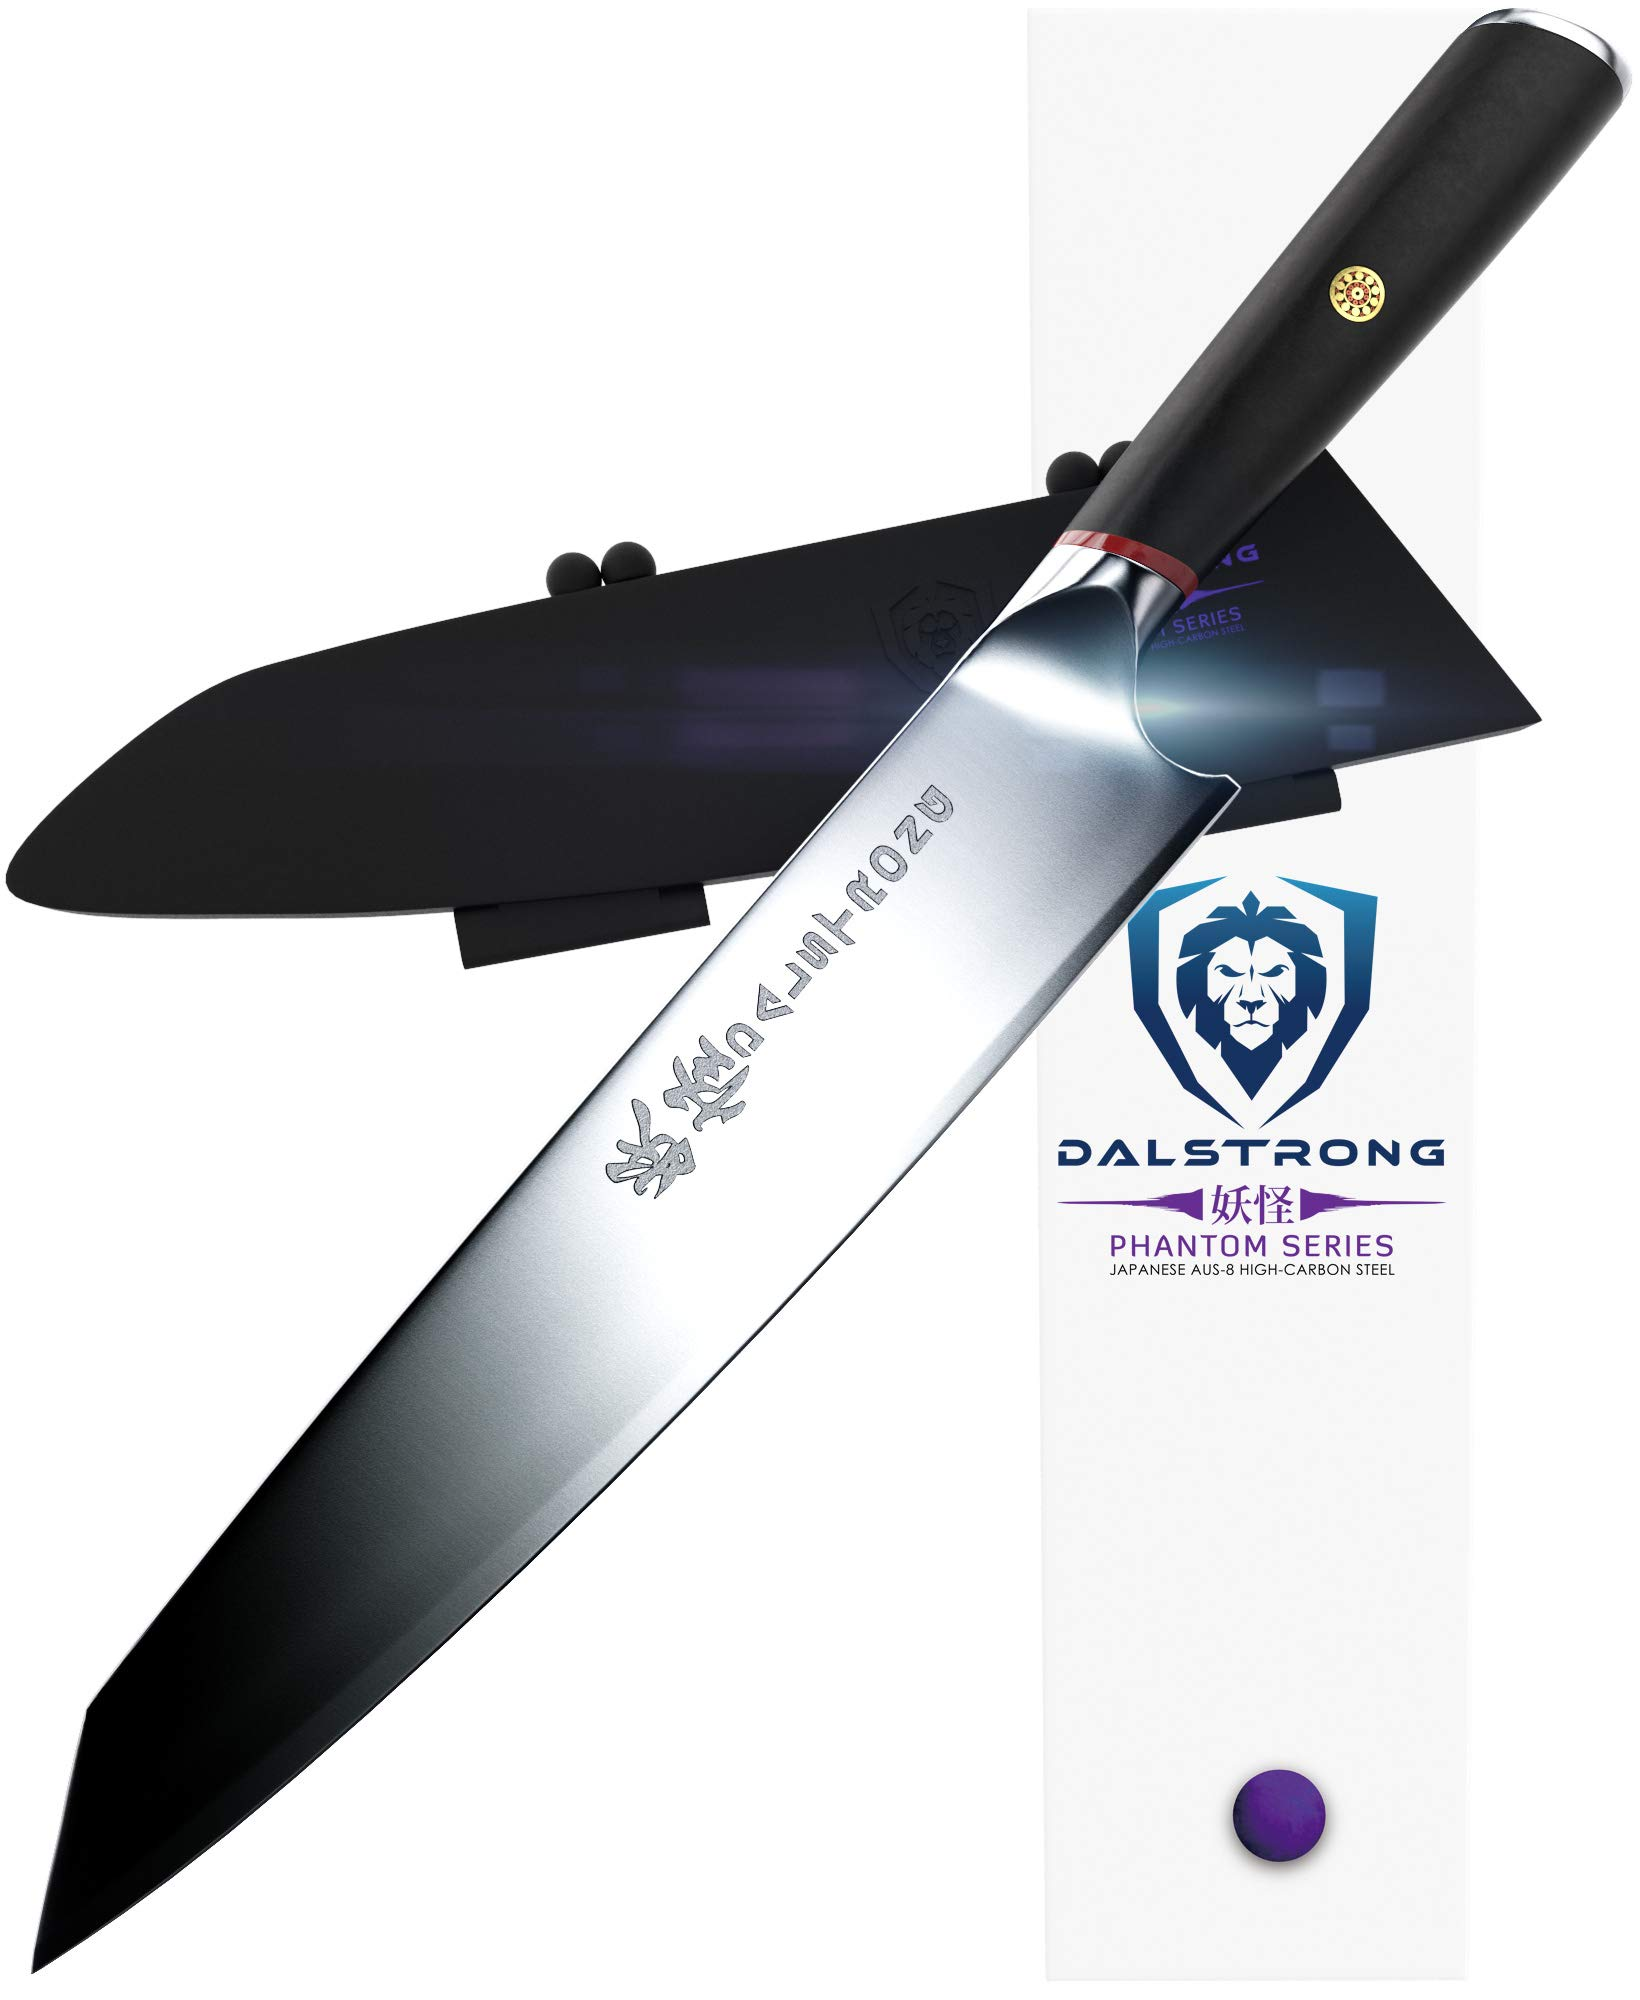 DALSTRONG Chef Knife - Phantom Series Gyuto - Japanese AUS8 Steel - 9.5'' - Sheath